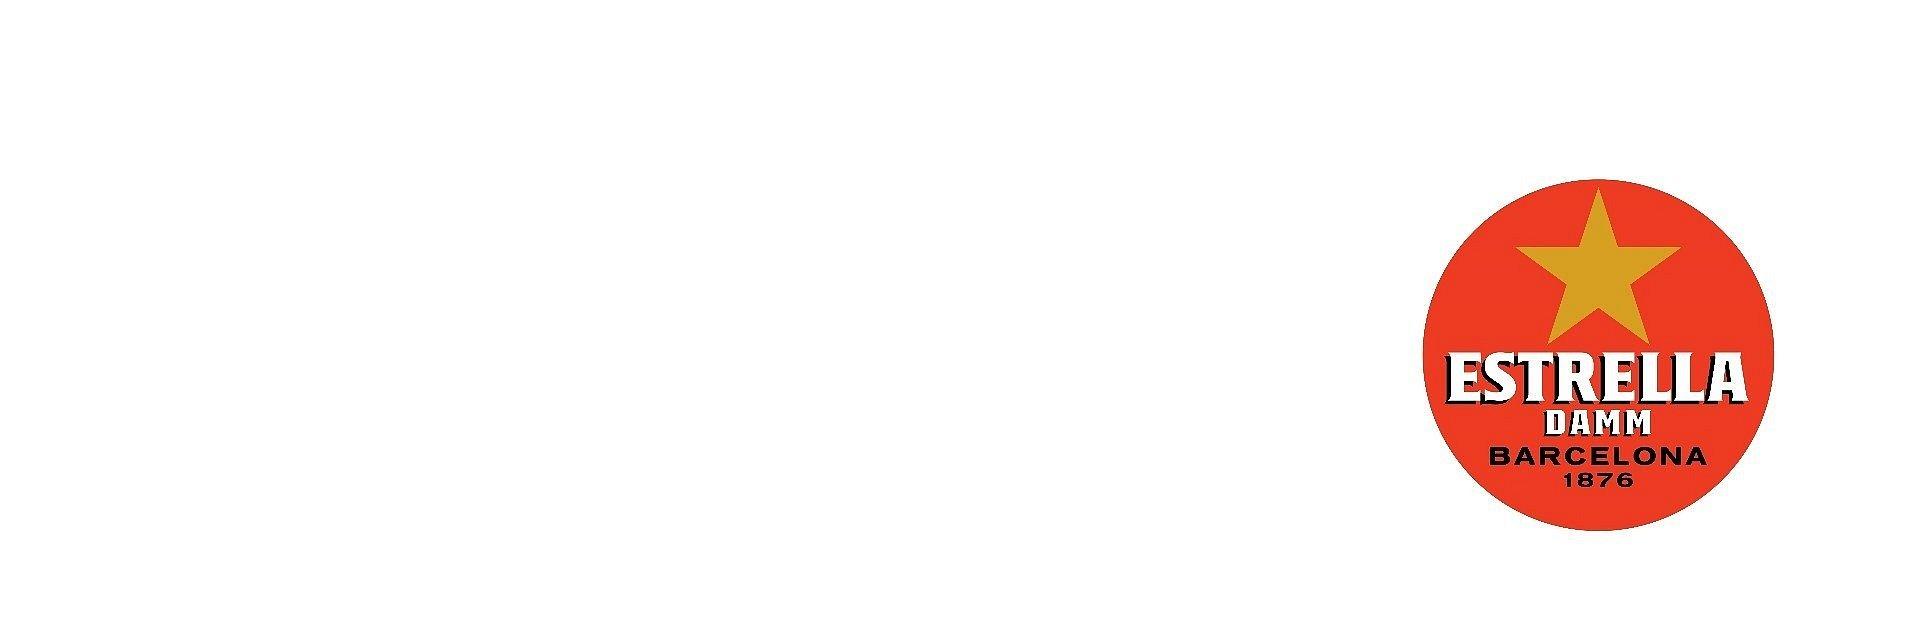 Estrella Damm patrocina Congresso dos Cozinheiros